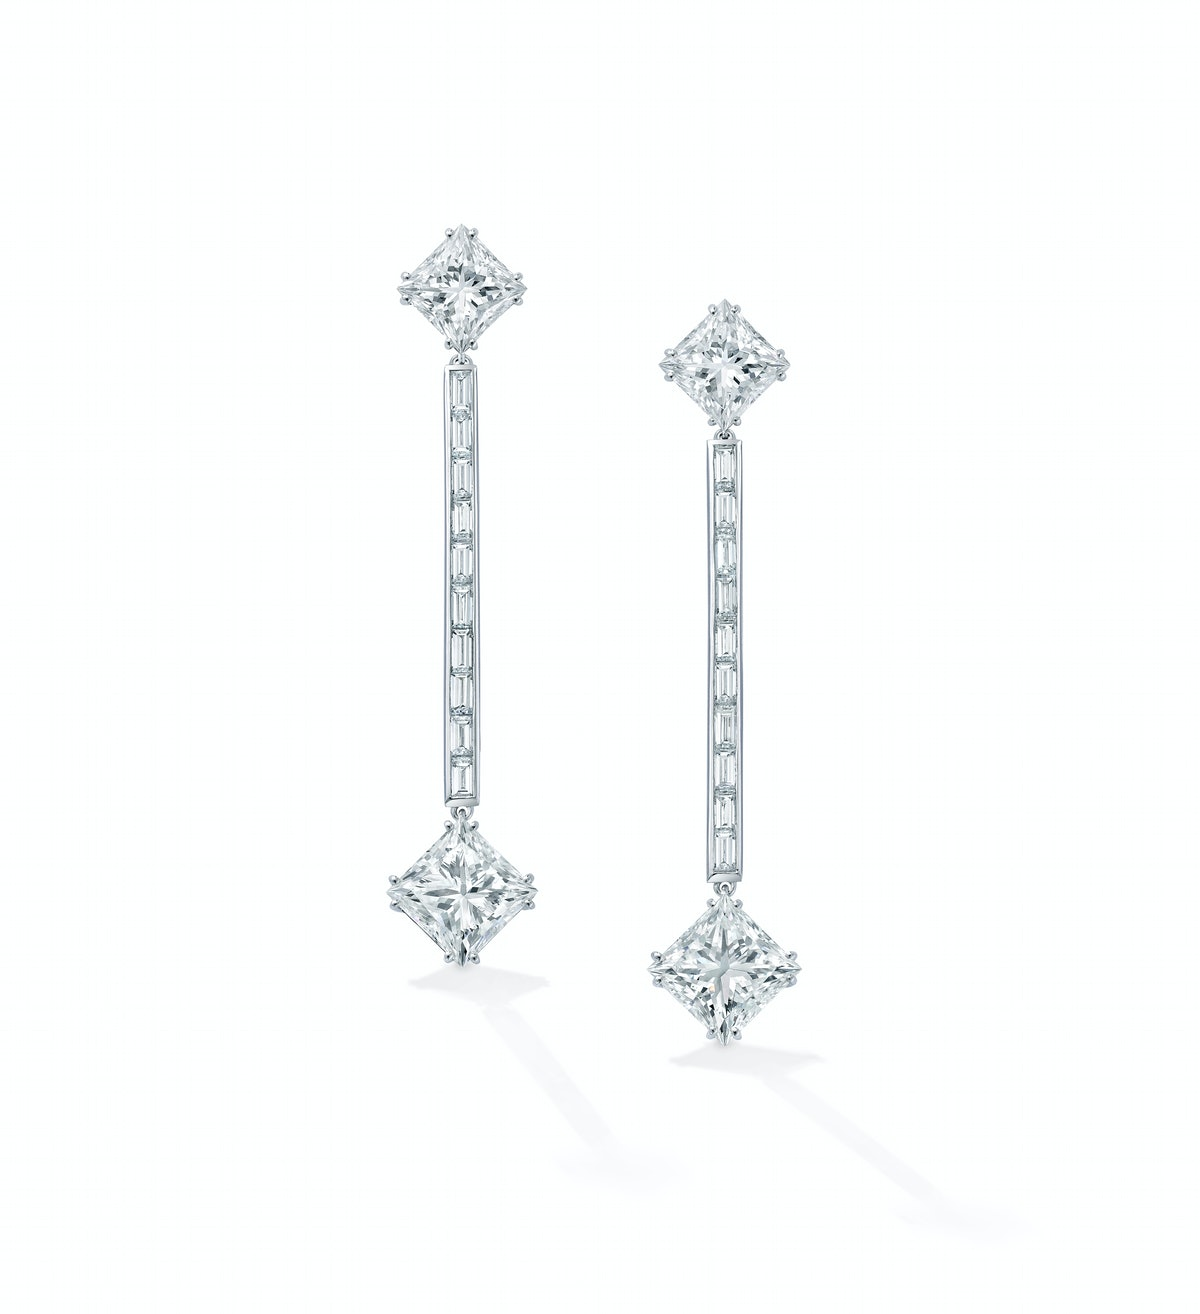 Forevermark jewelry